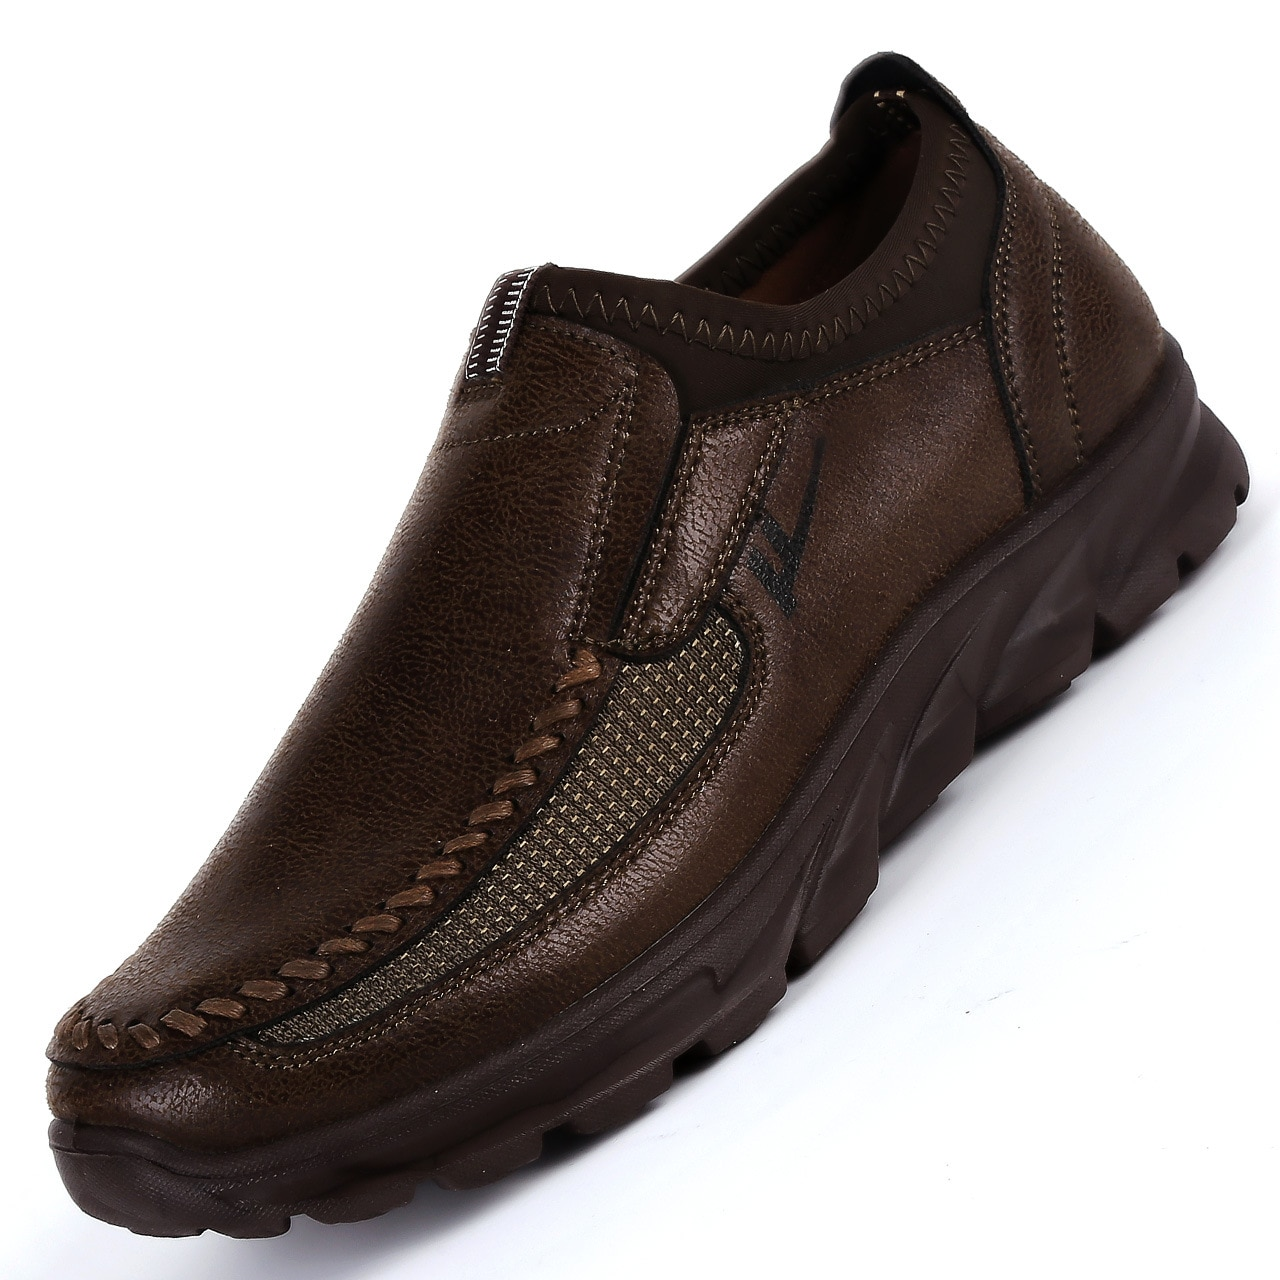 Zapatos informales de marca de lujo para hombre, Zapatillas ligeras transpirables, zapatos de caminar para hombre, malla de moda, calzado, tamaño grande 38-48